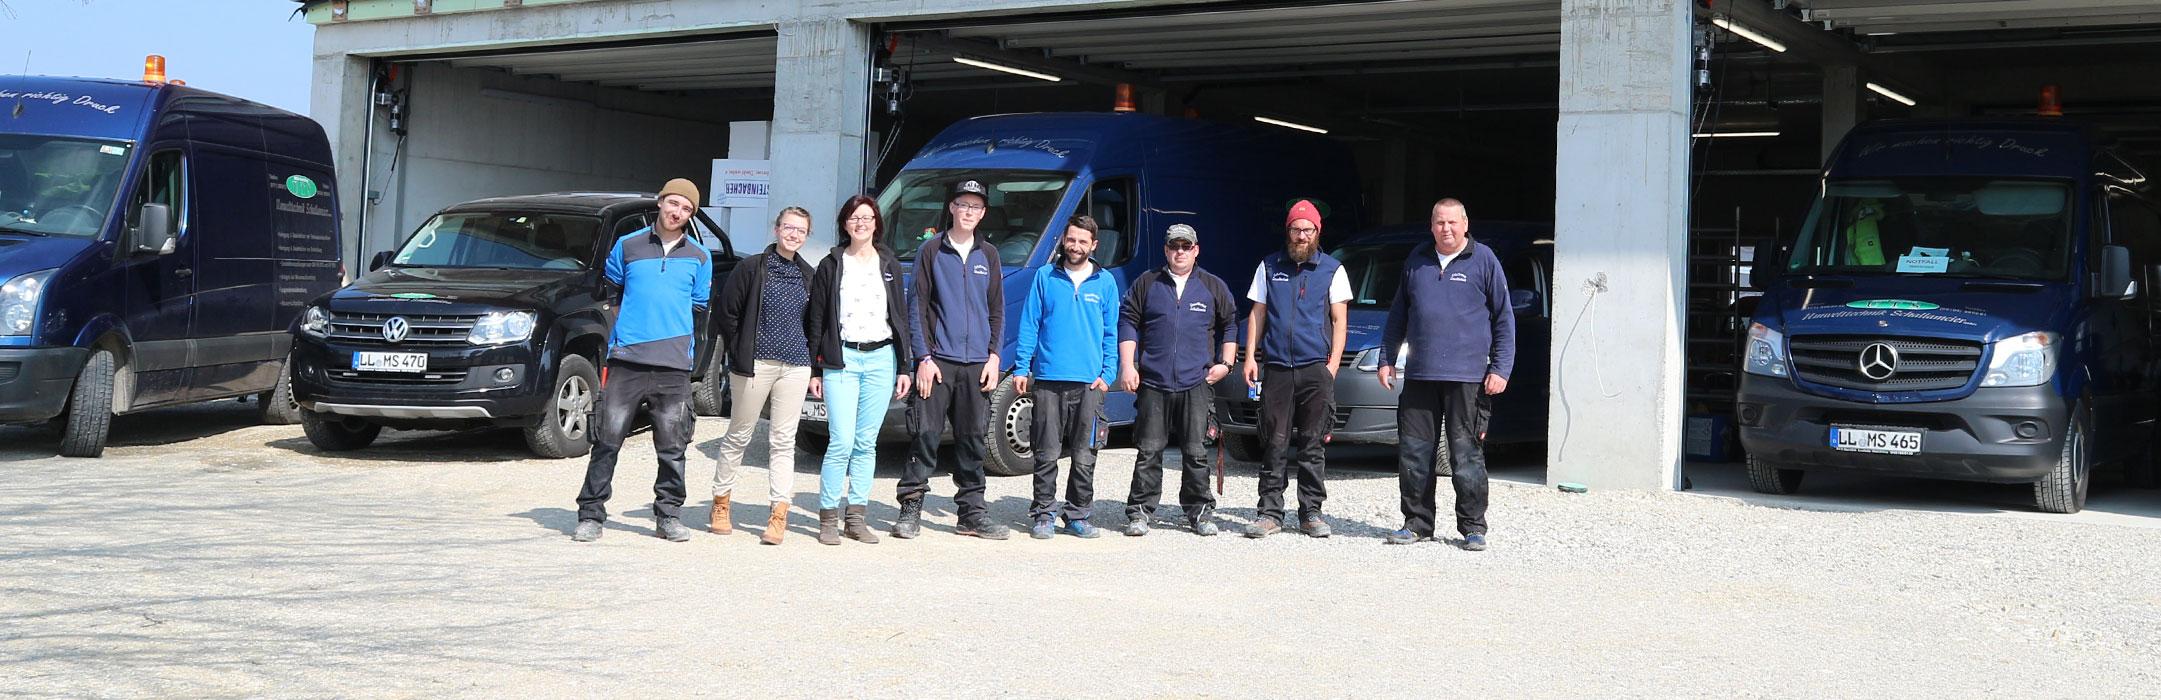 UTS-Slider-Team-UTS-2019